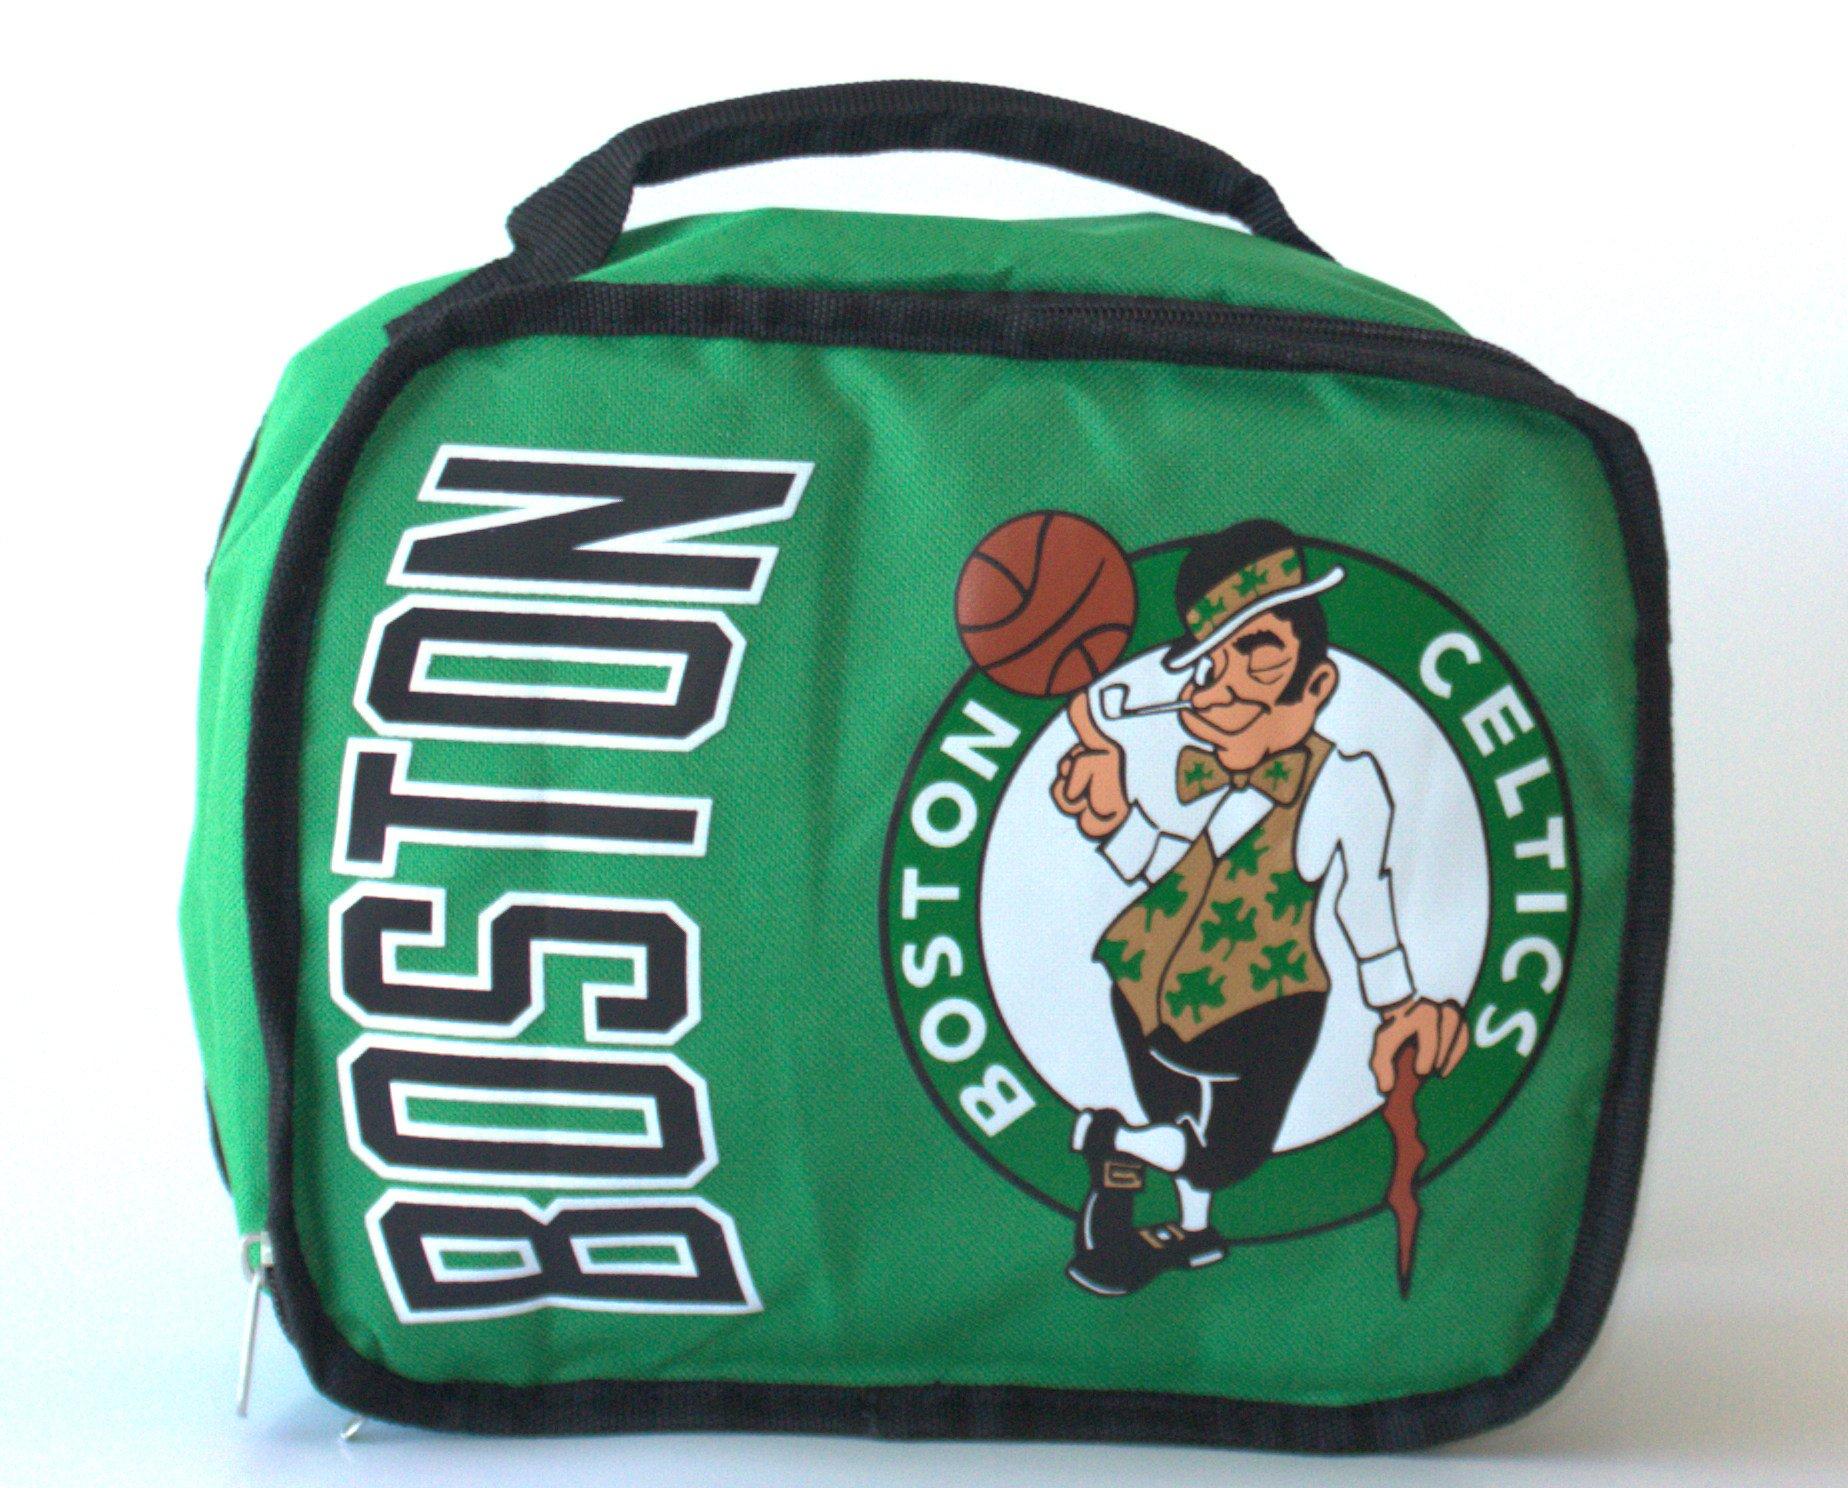 The Northwest Company NBA Boston Celtics Sacked Lunchbox, 10.5-Inch, Green